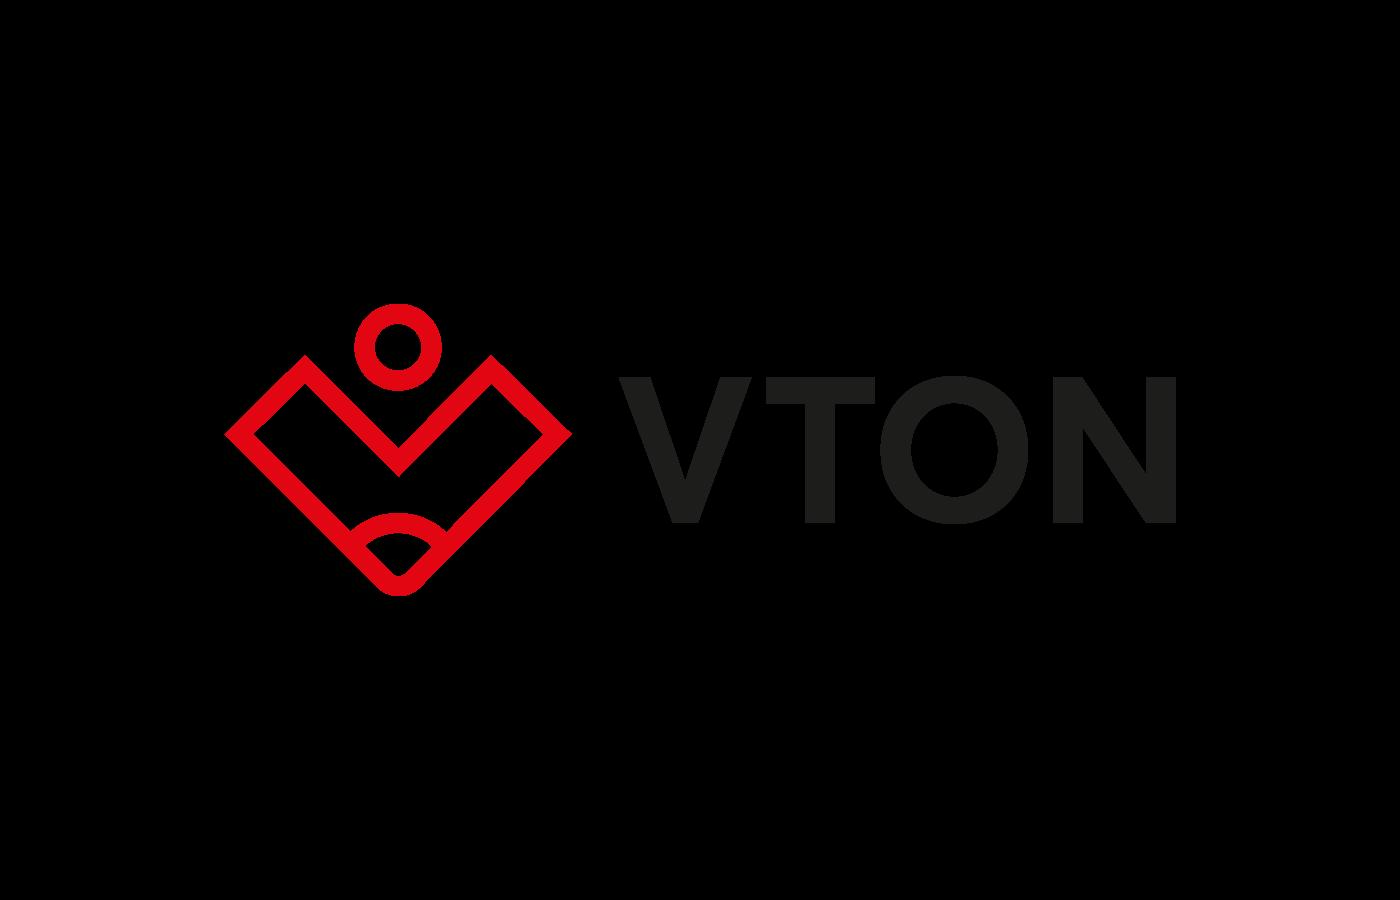 VTON logo